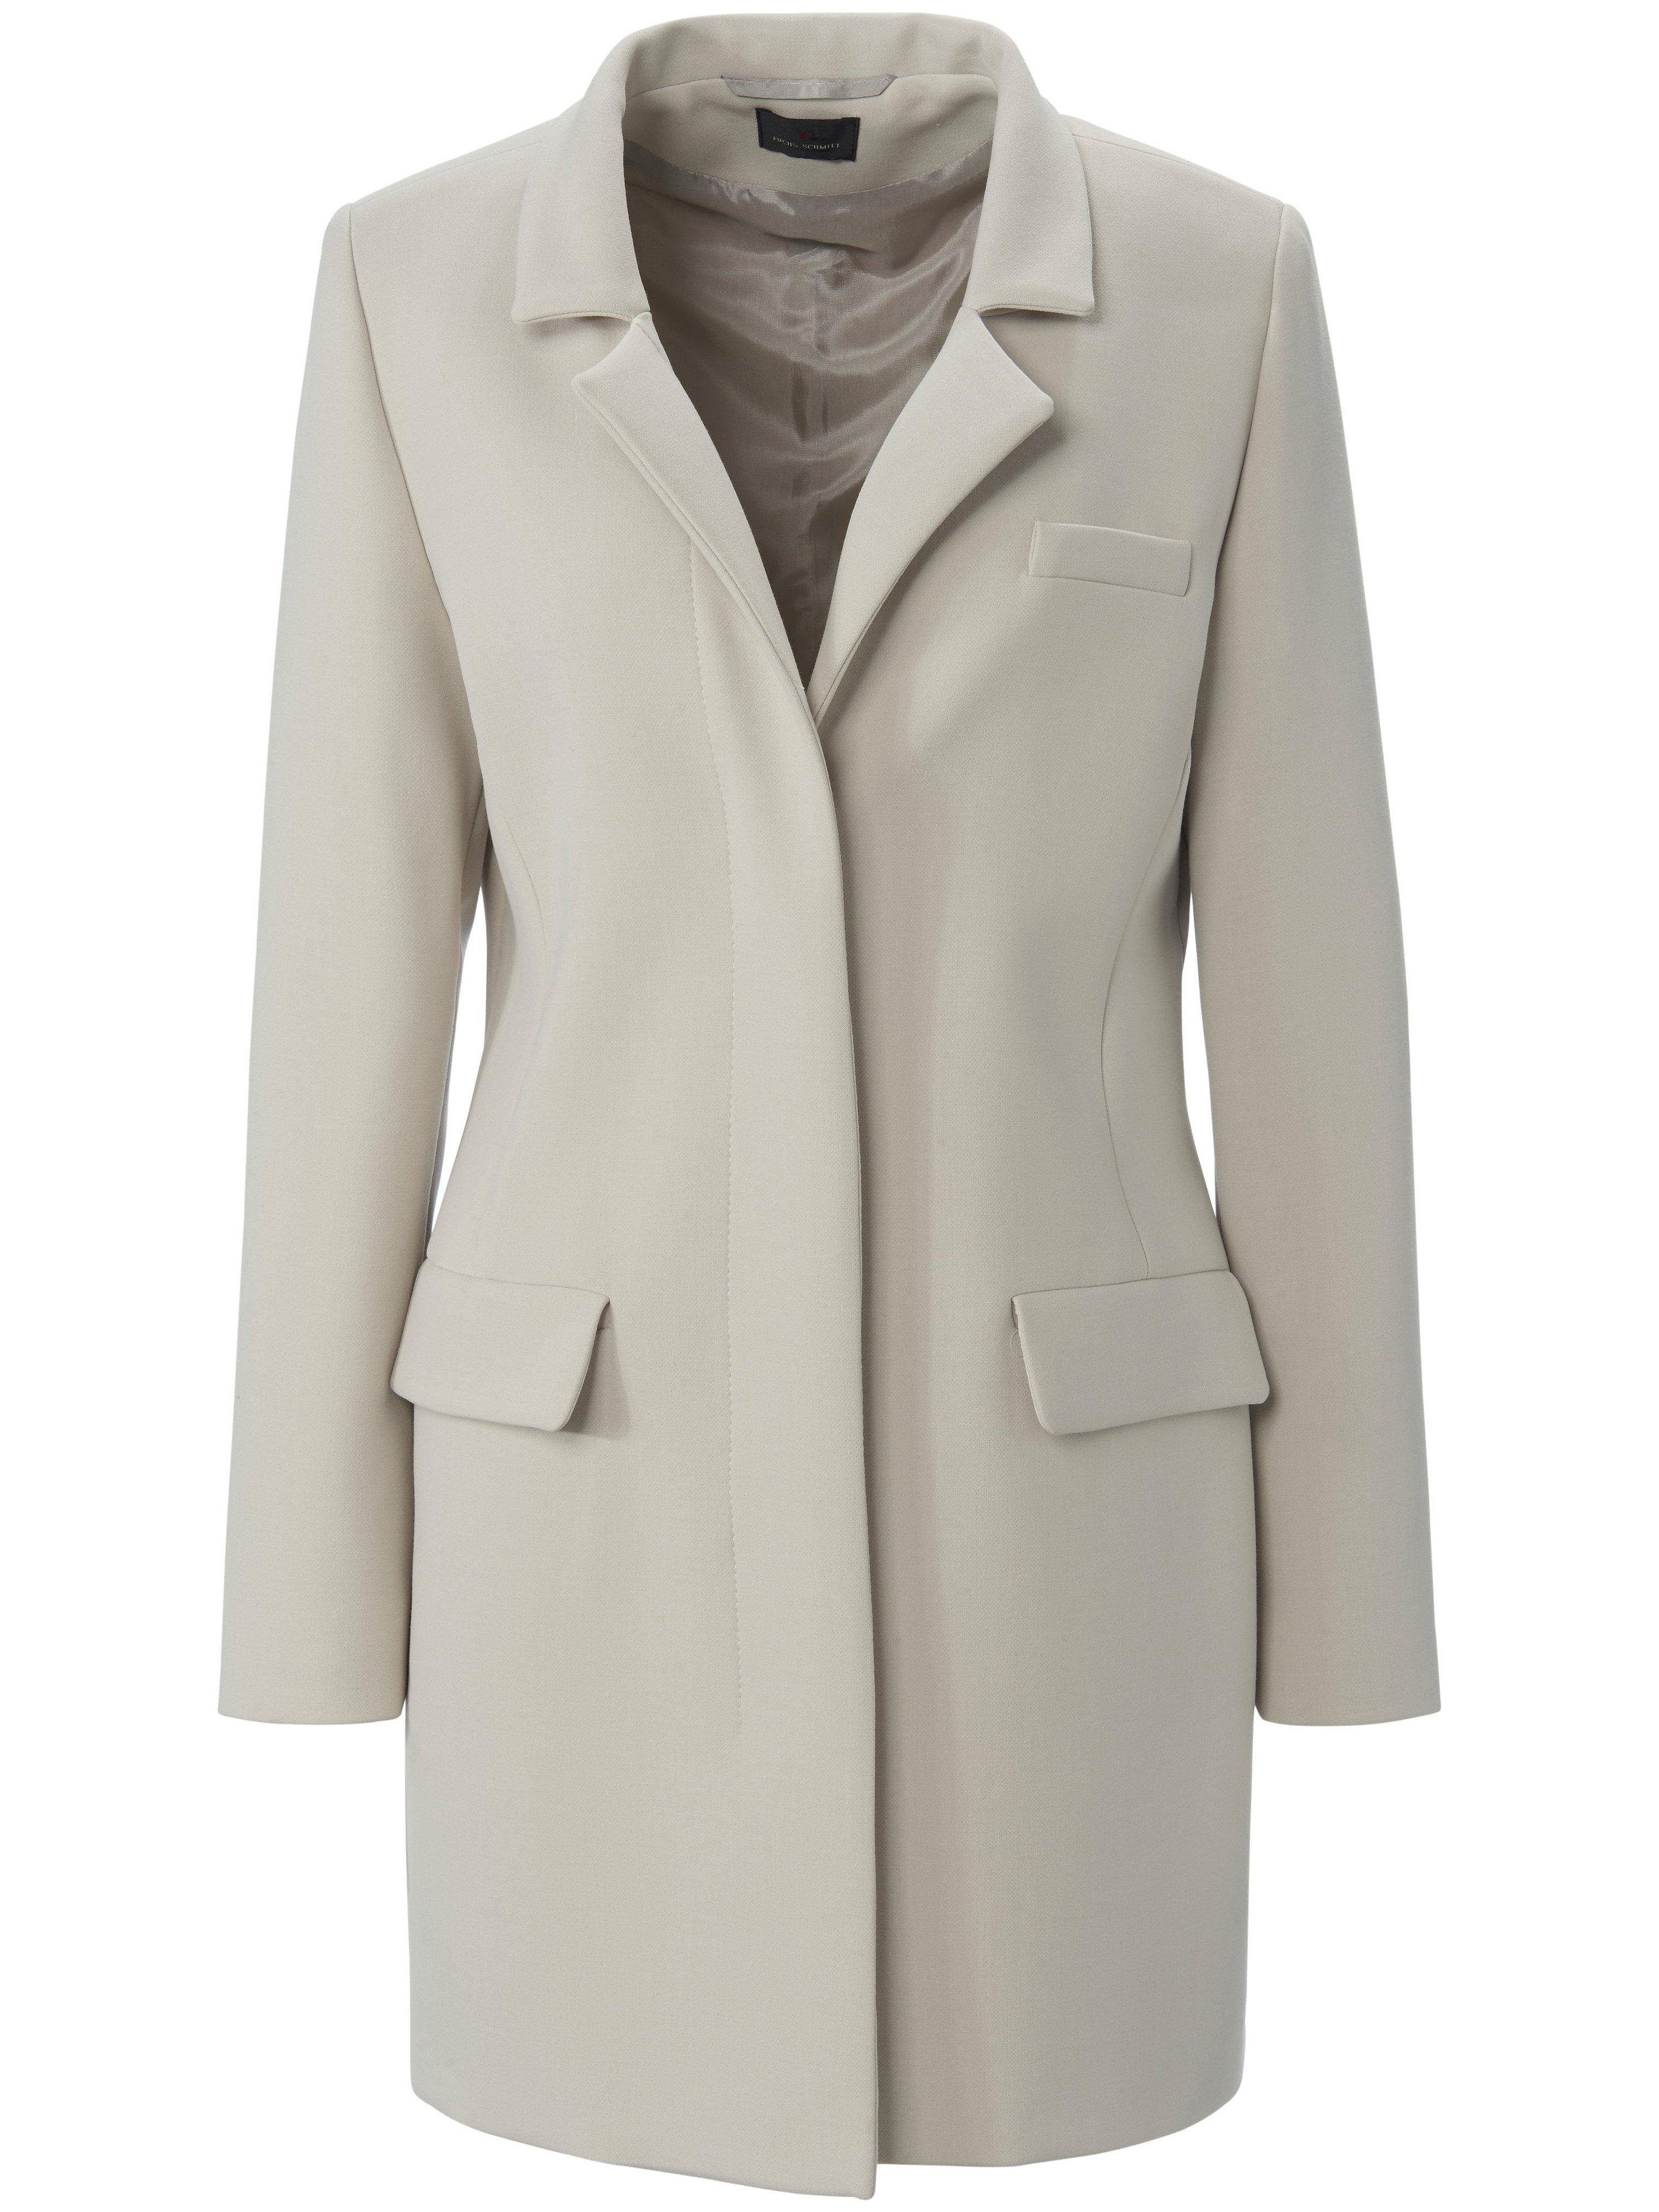 Le manteau 3/4  Fuchs & Schmitt beige taille 40